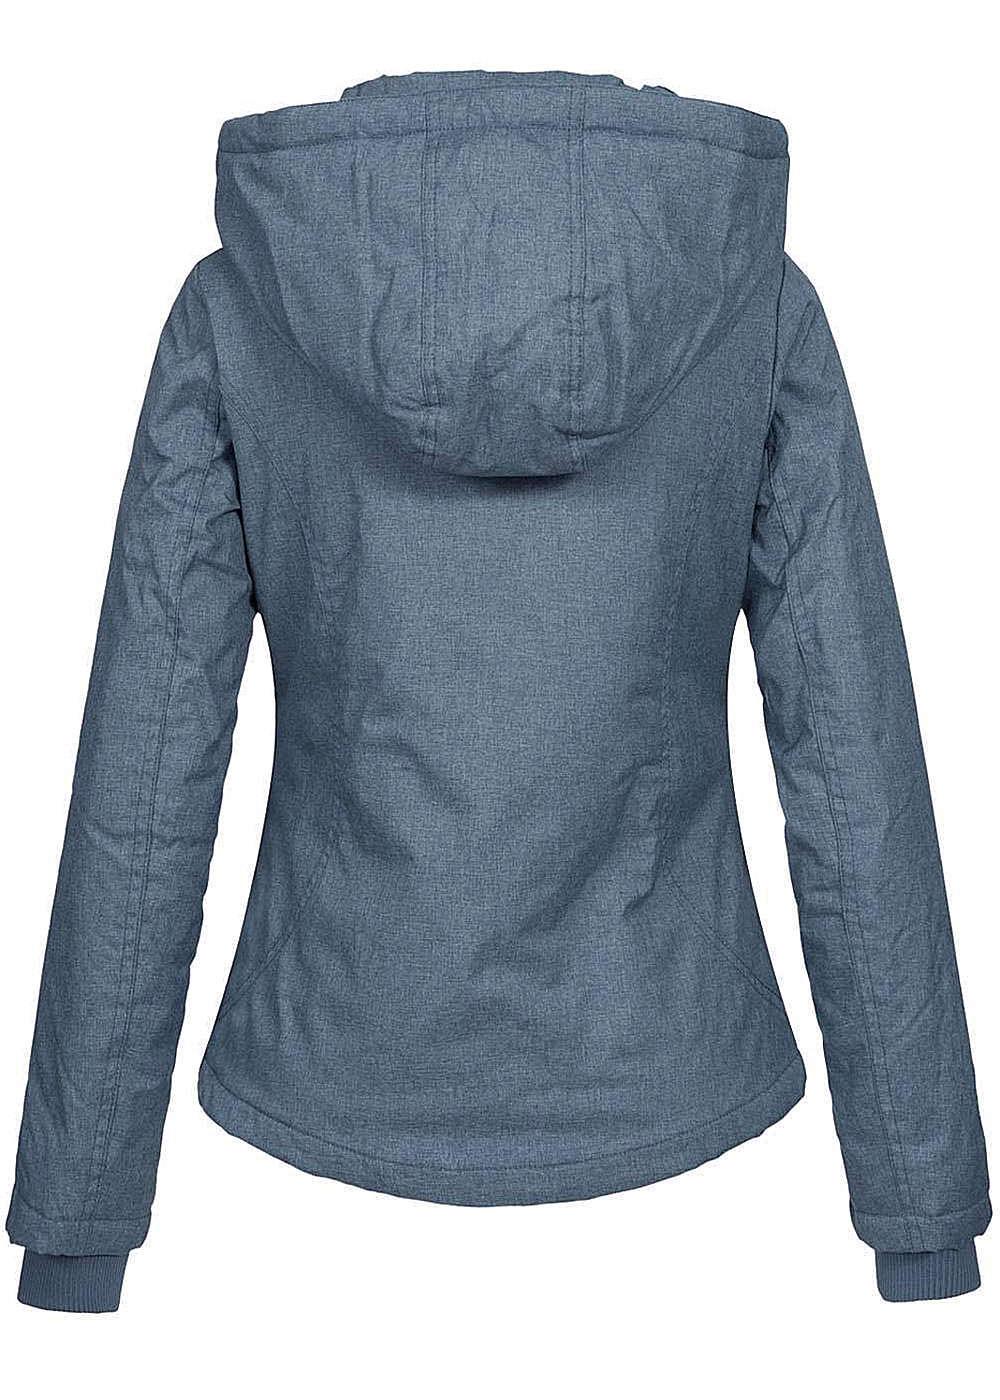 Eight2nine damen winterjacke wasserabweisend asym zipper